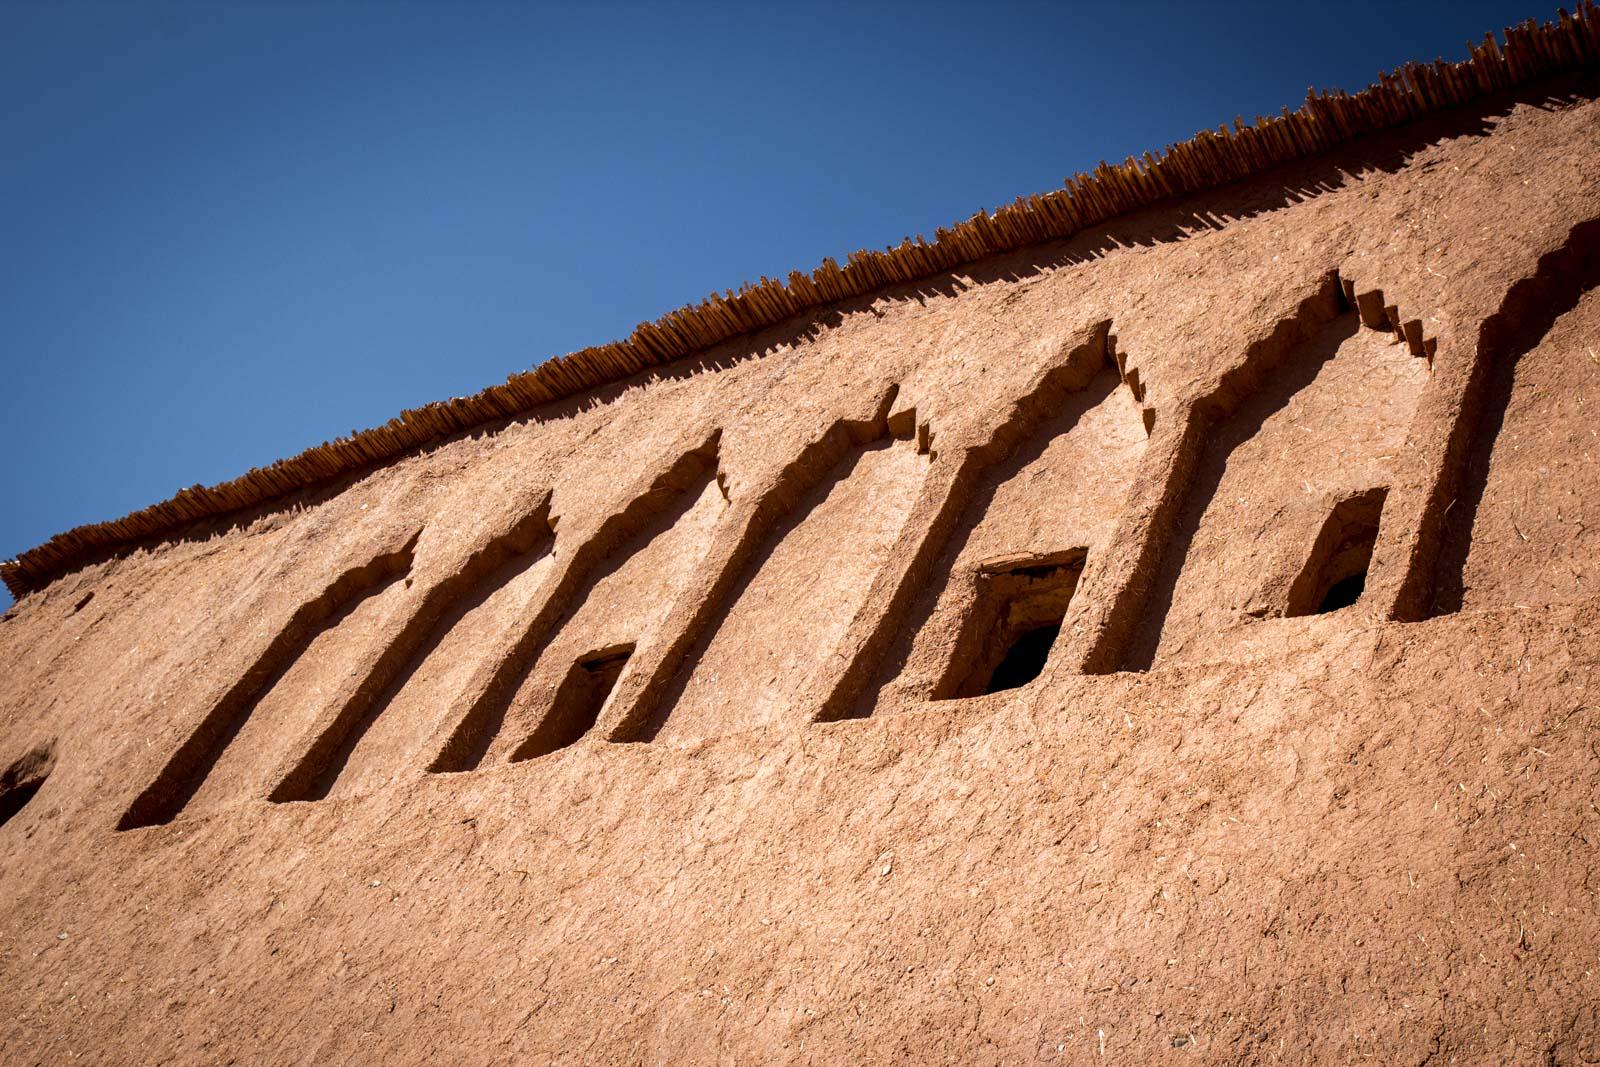 Ait Ben Haddou, Game of Thrones set, Morocco